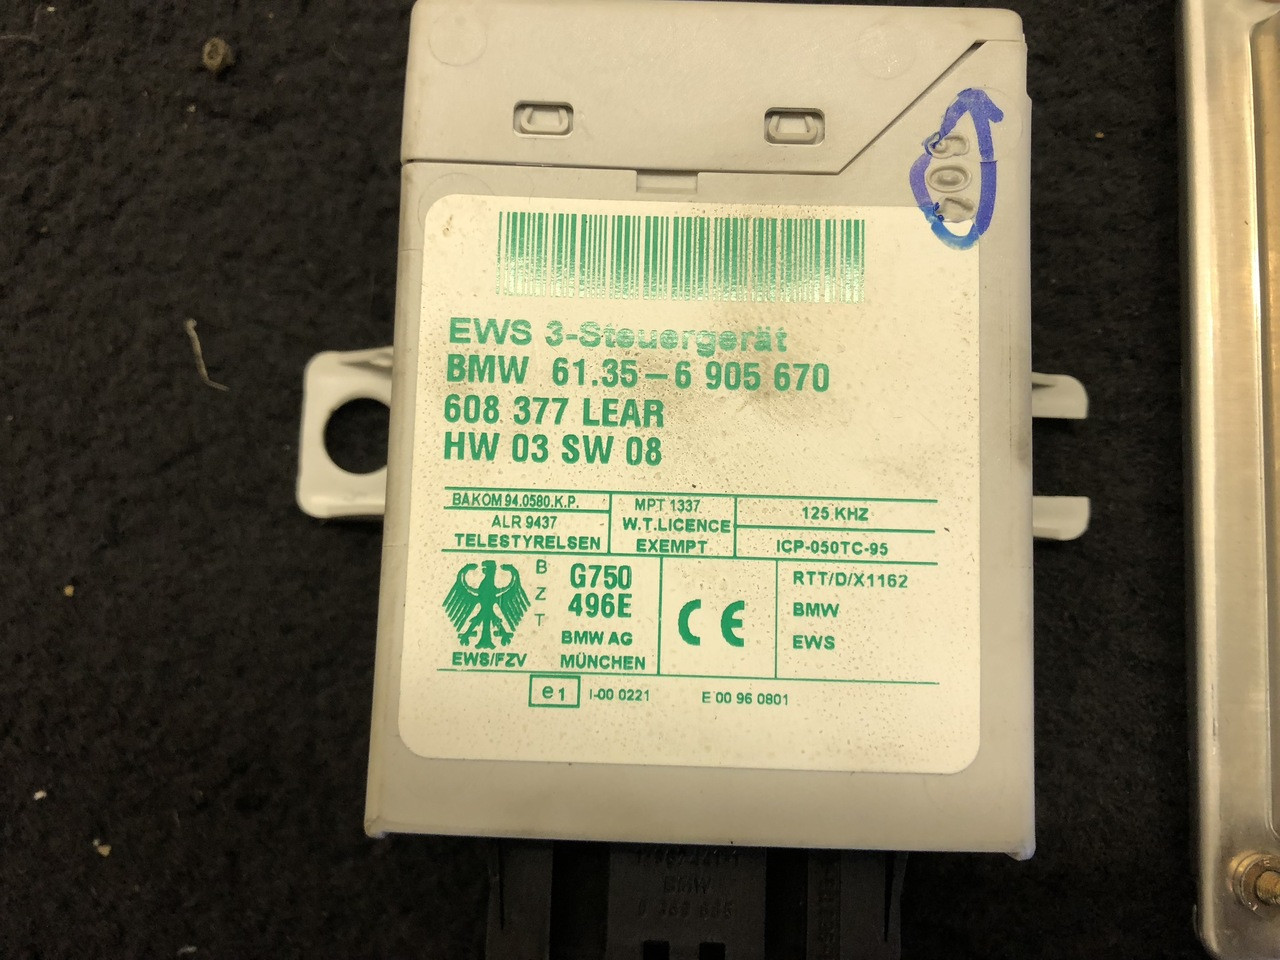 E46 Complete EWS Key Kit With DME